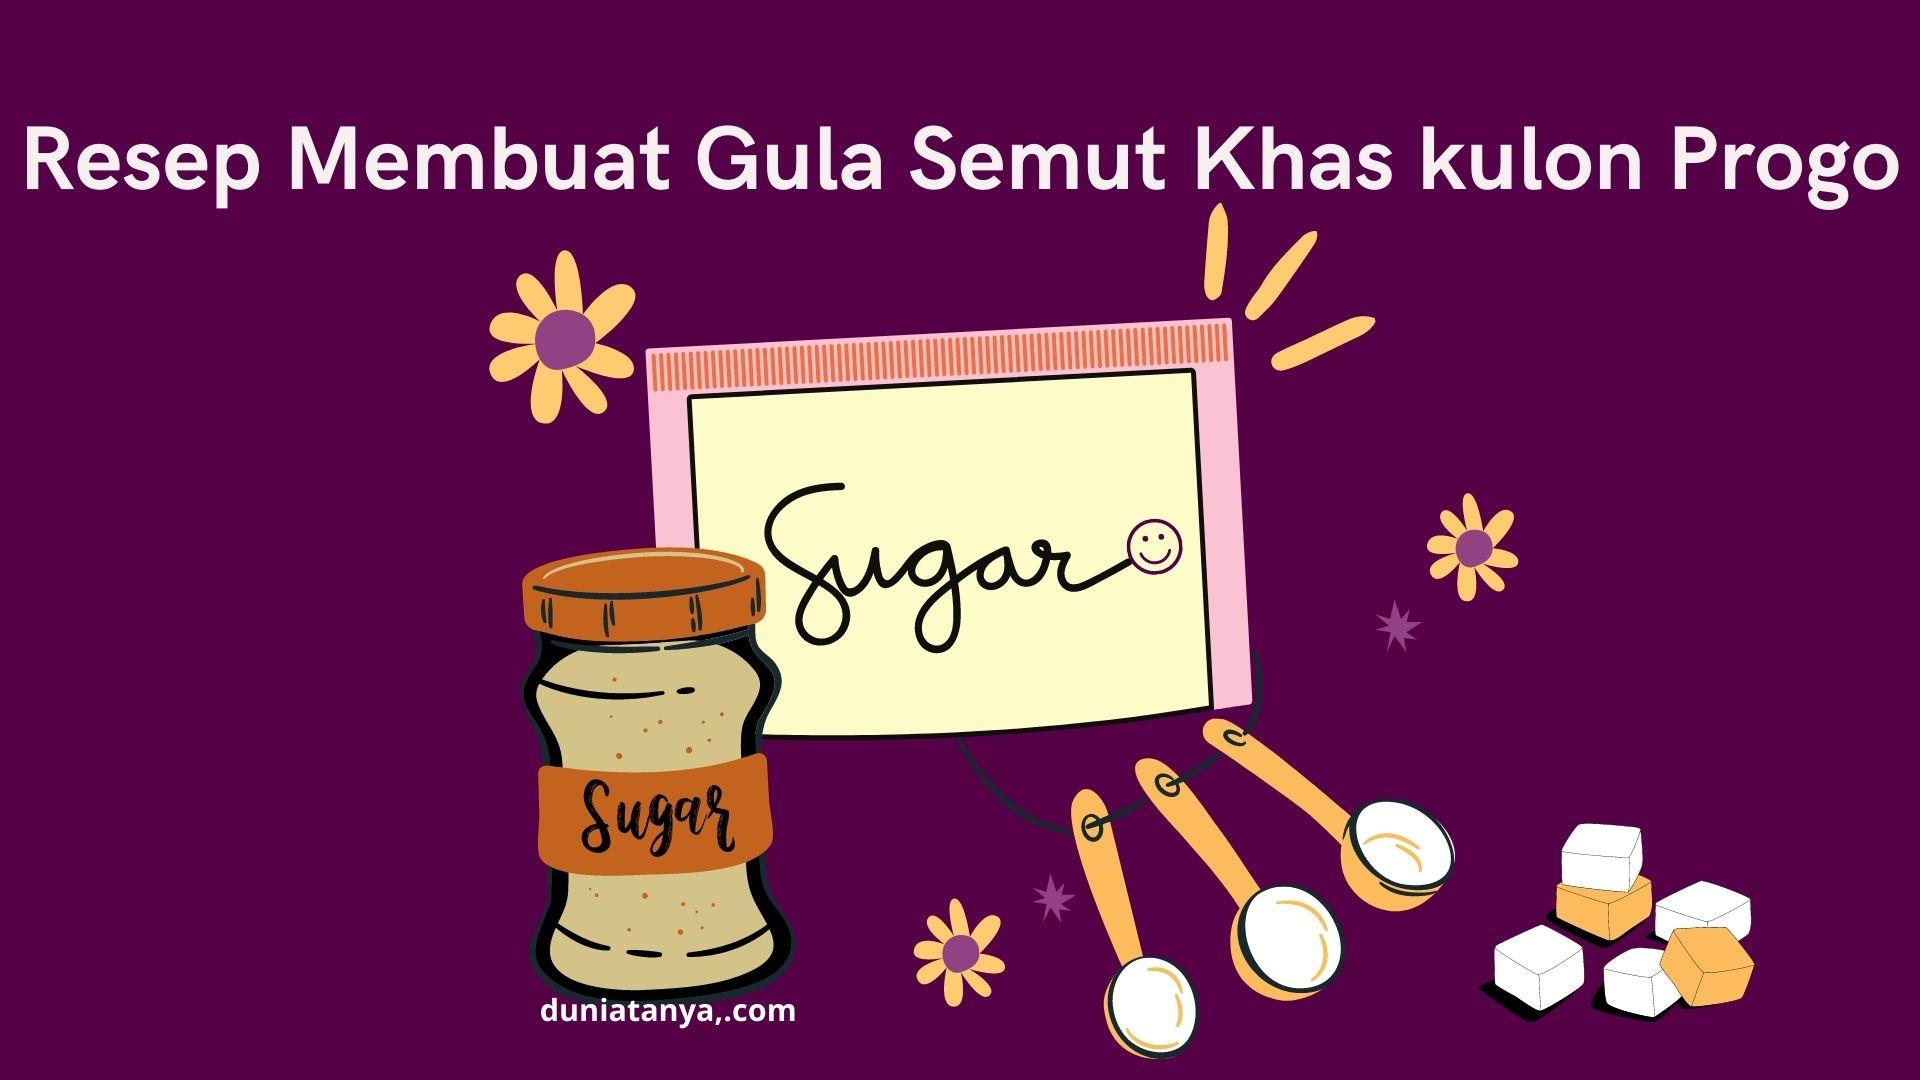 Read more about the article Resep Membuat Gula Semut Khas Kulon Progo